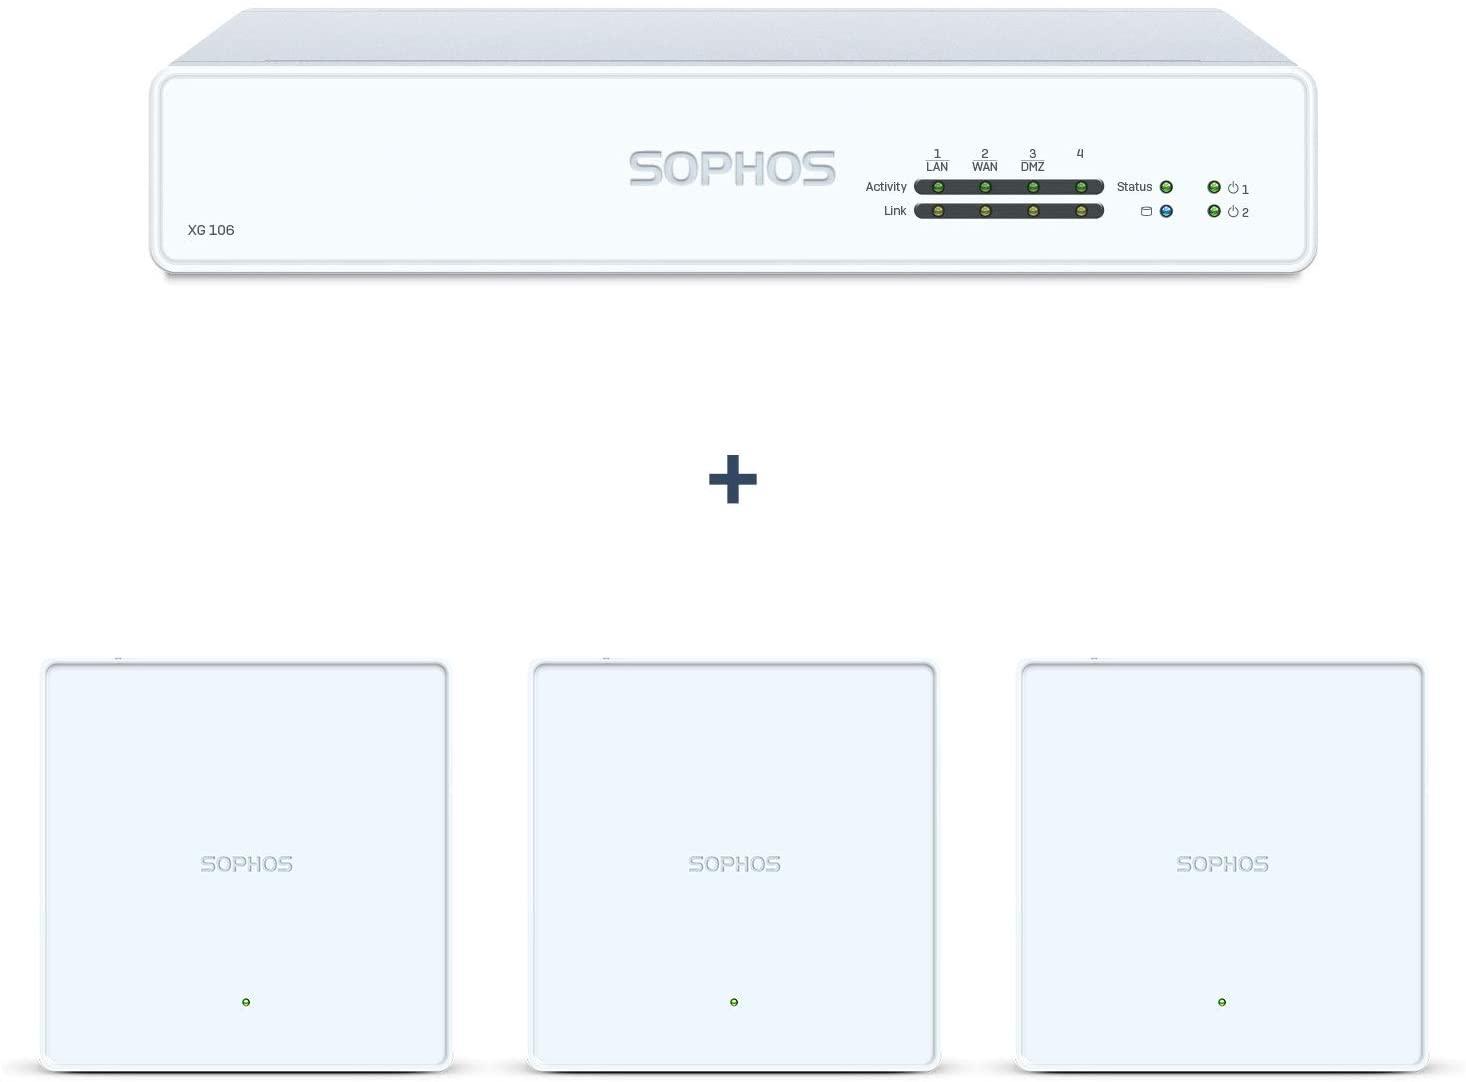 Sophos XG 106 rev.1 Firewall Bundle with APX 740 (3-Pack) Access Point (XG1ZTCHEK+A740TCHNF)